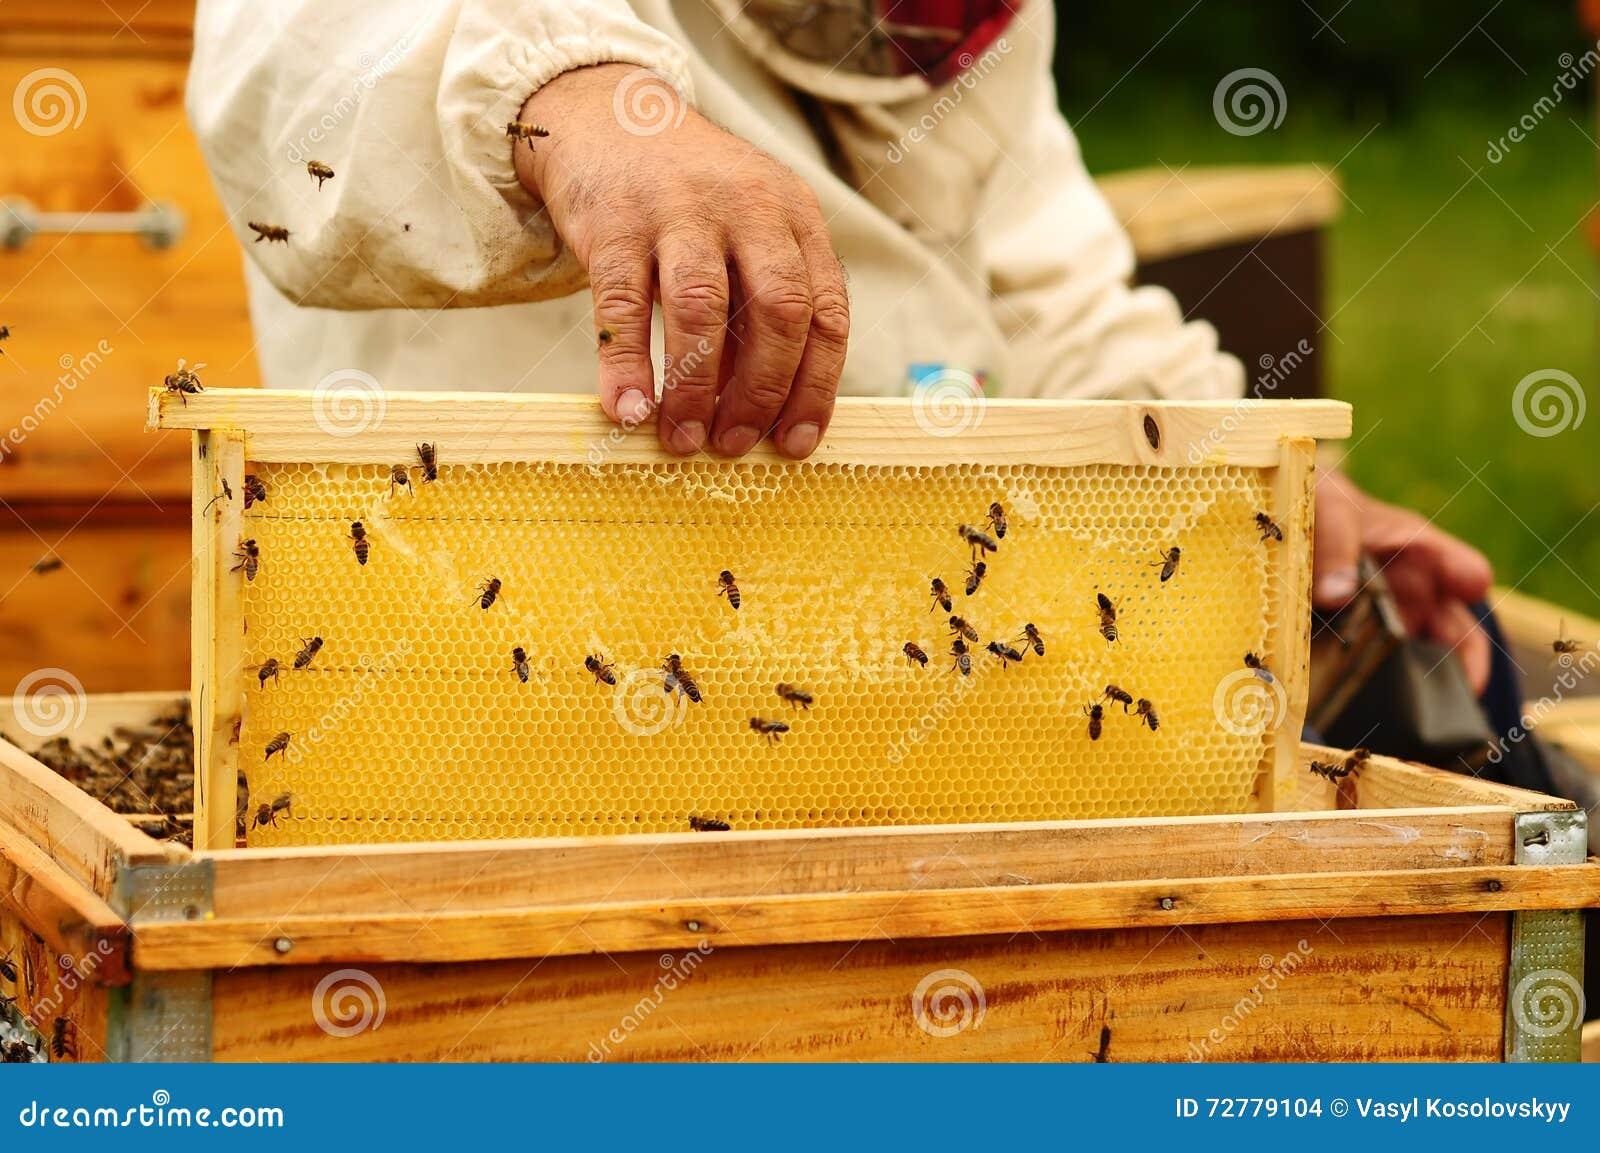 Beekeeper holding frame of honeycomb